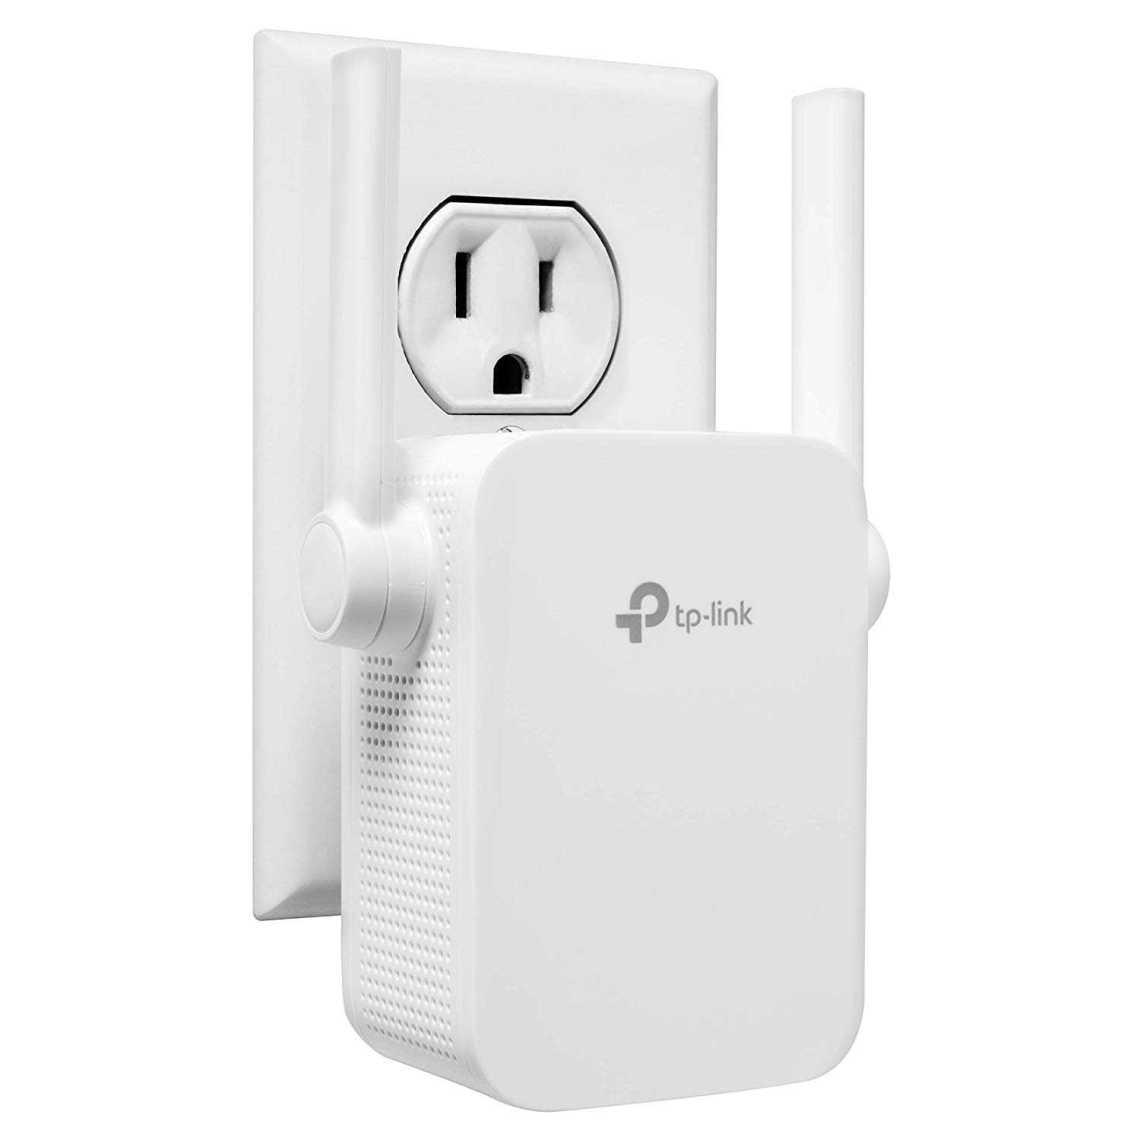 TP-Link | N300 WiFi Range Extender